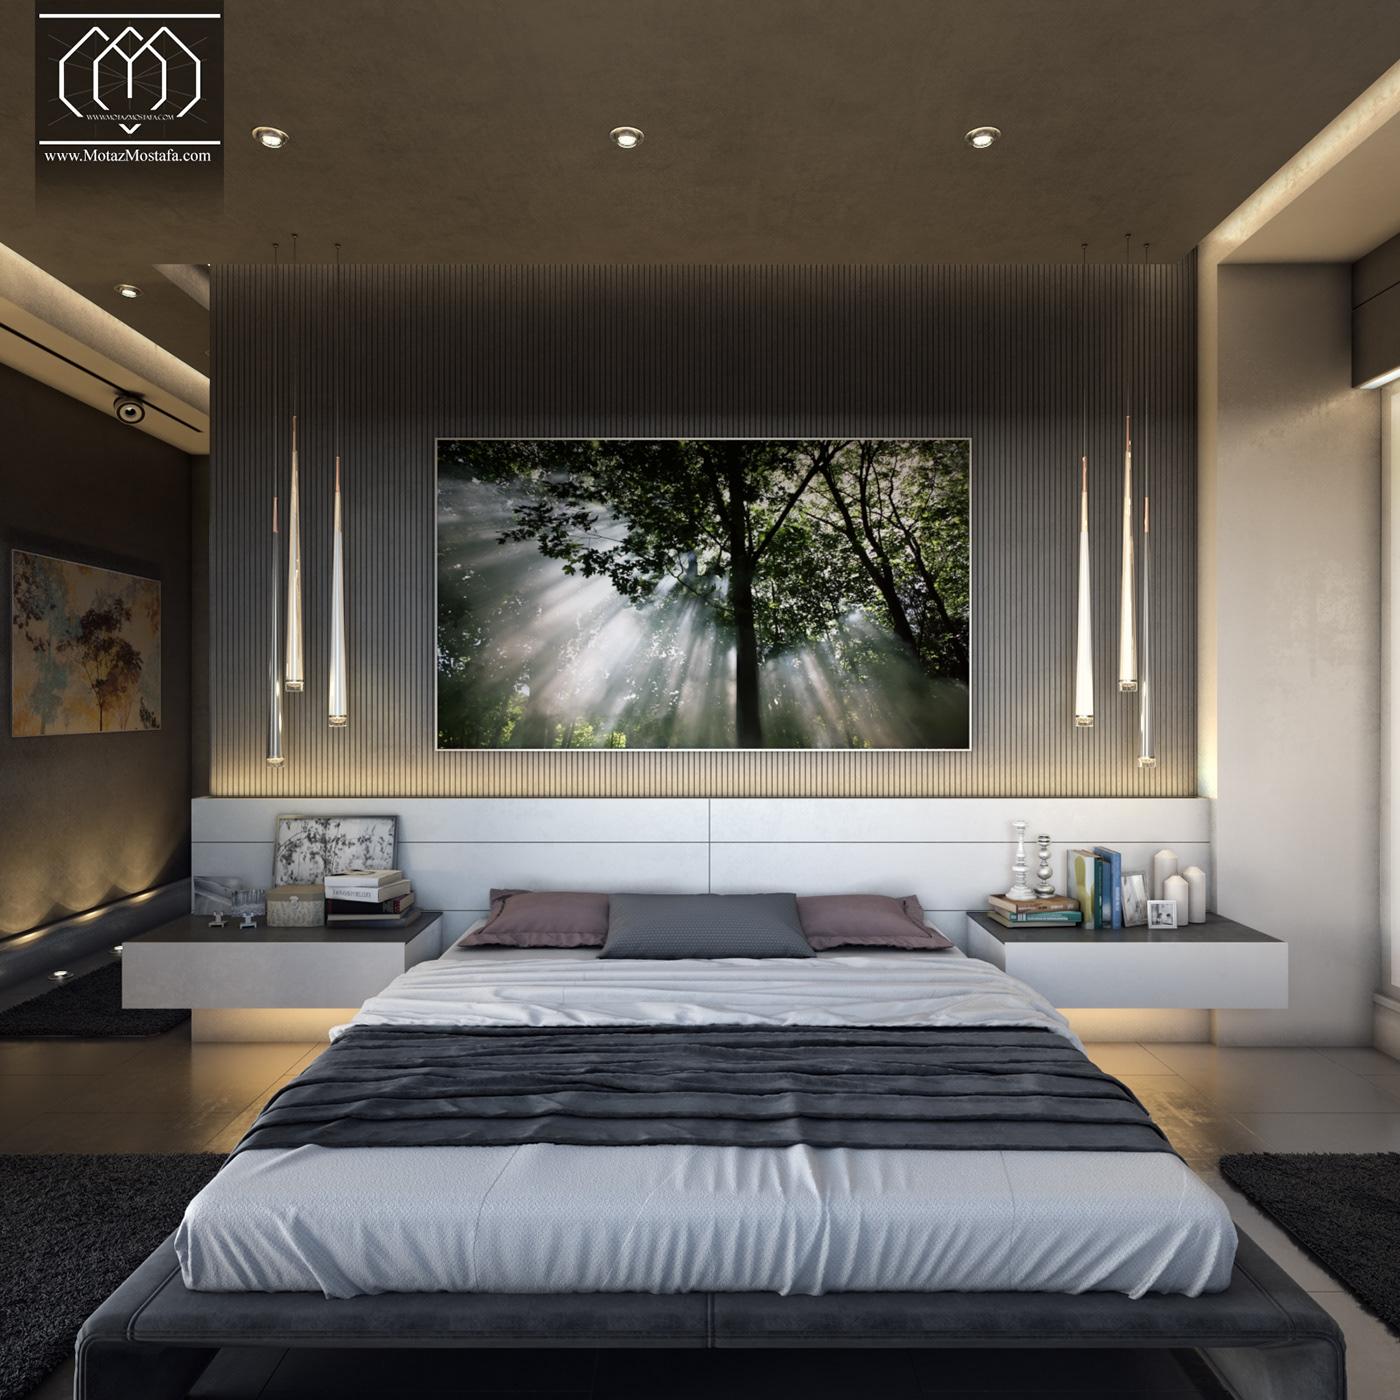 architecture interior design  Interior design creative decor modern art Style Motaz mostafa